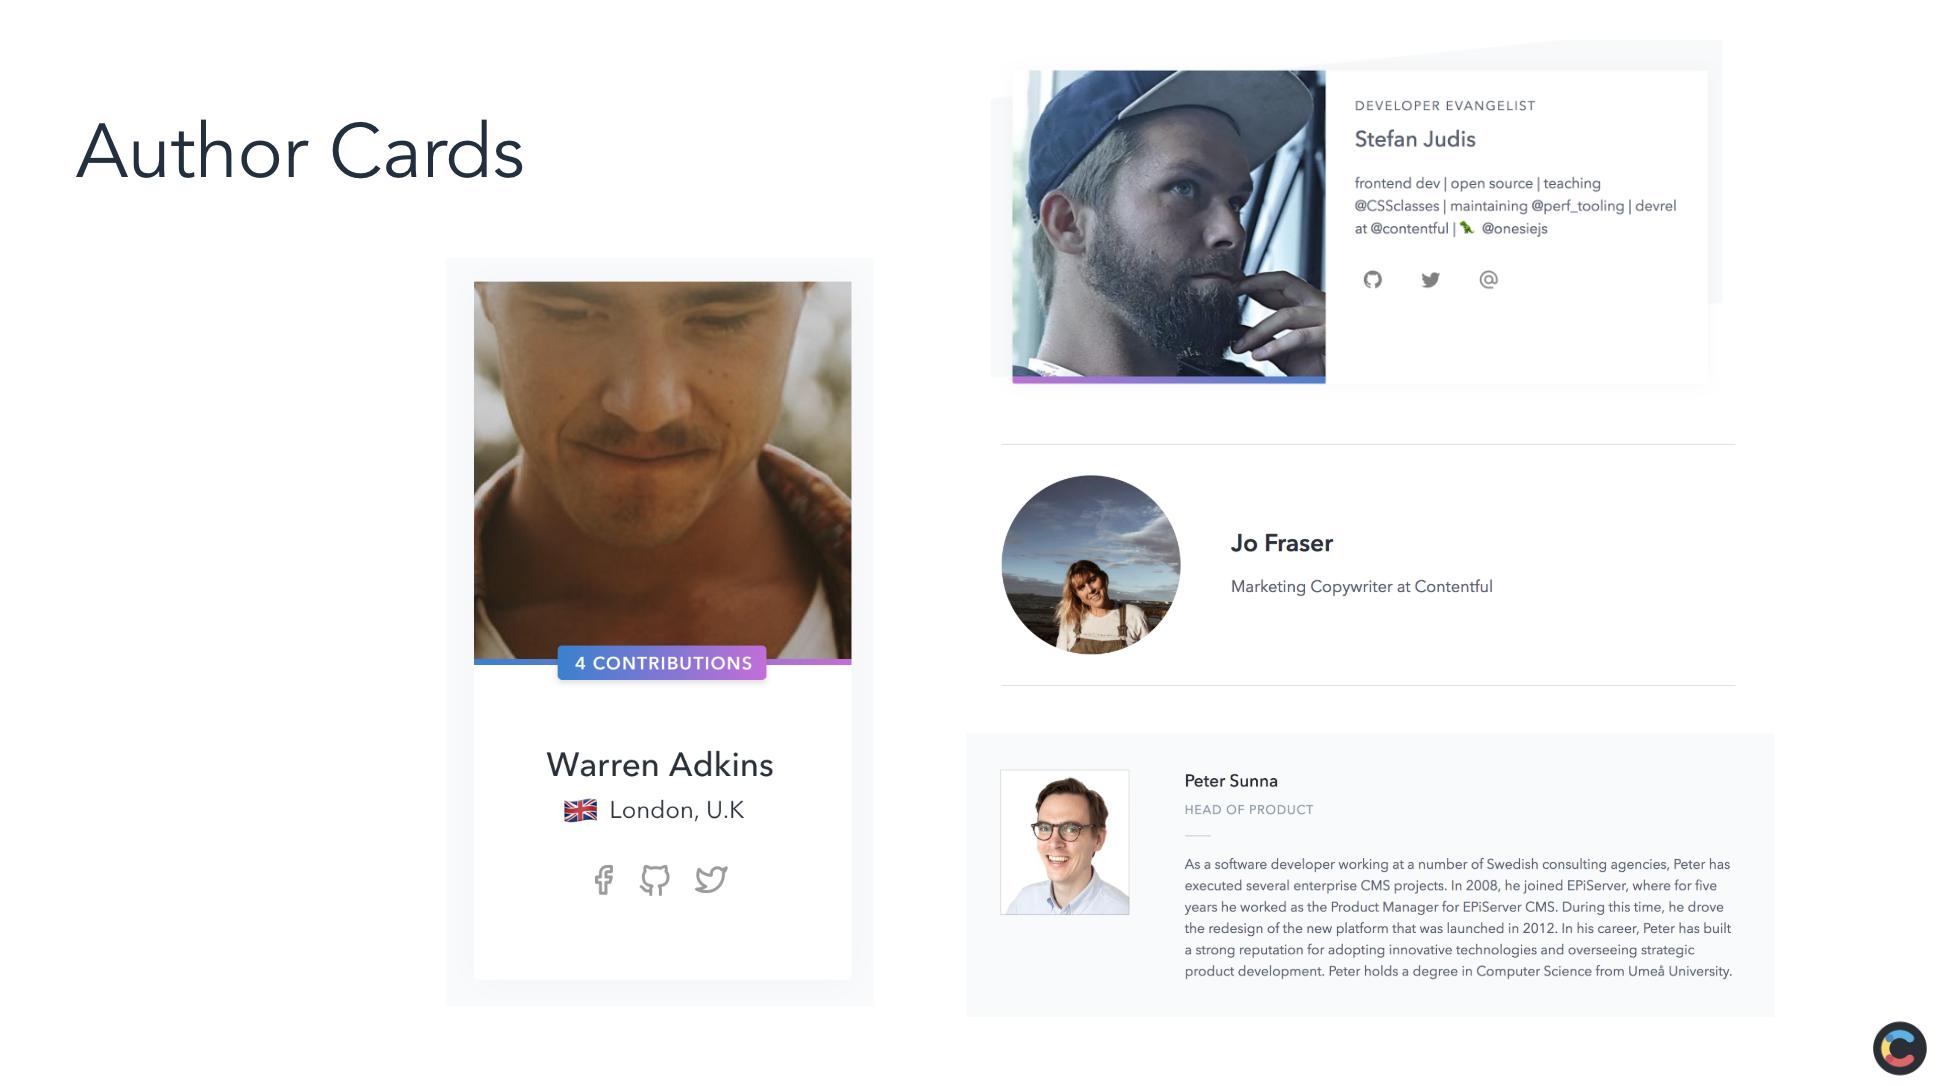 UI Audit: Inconsistent Author Cards